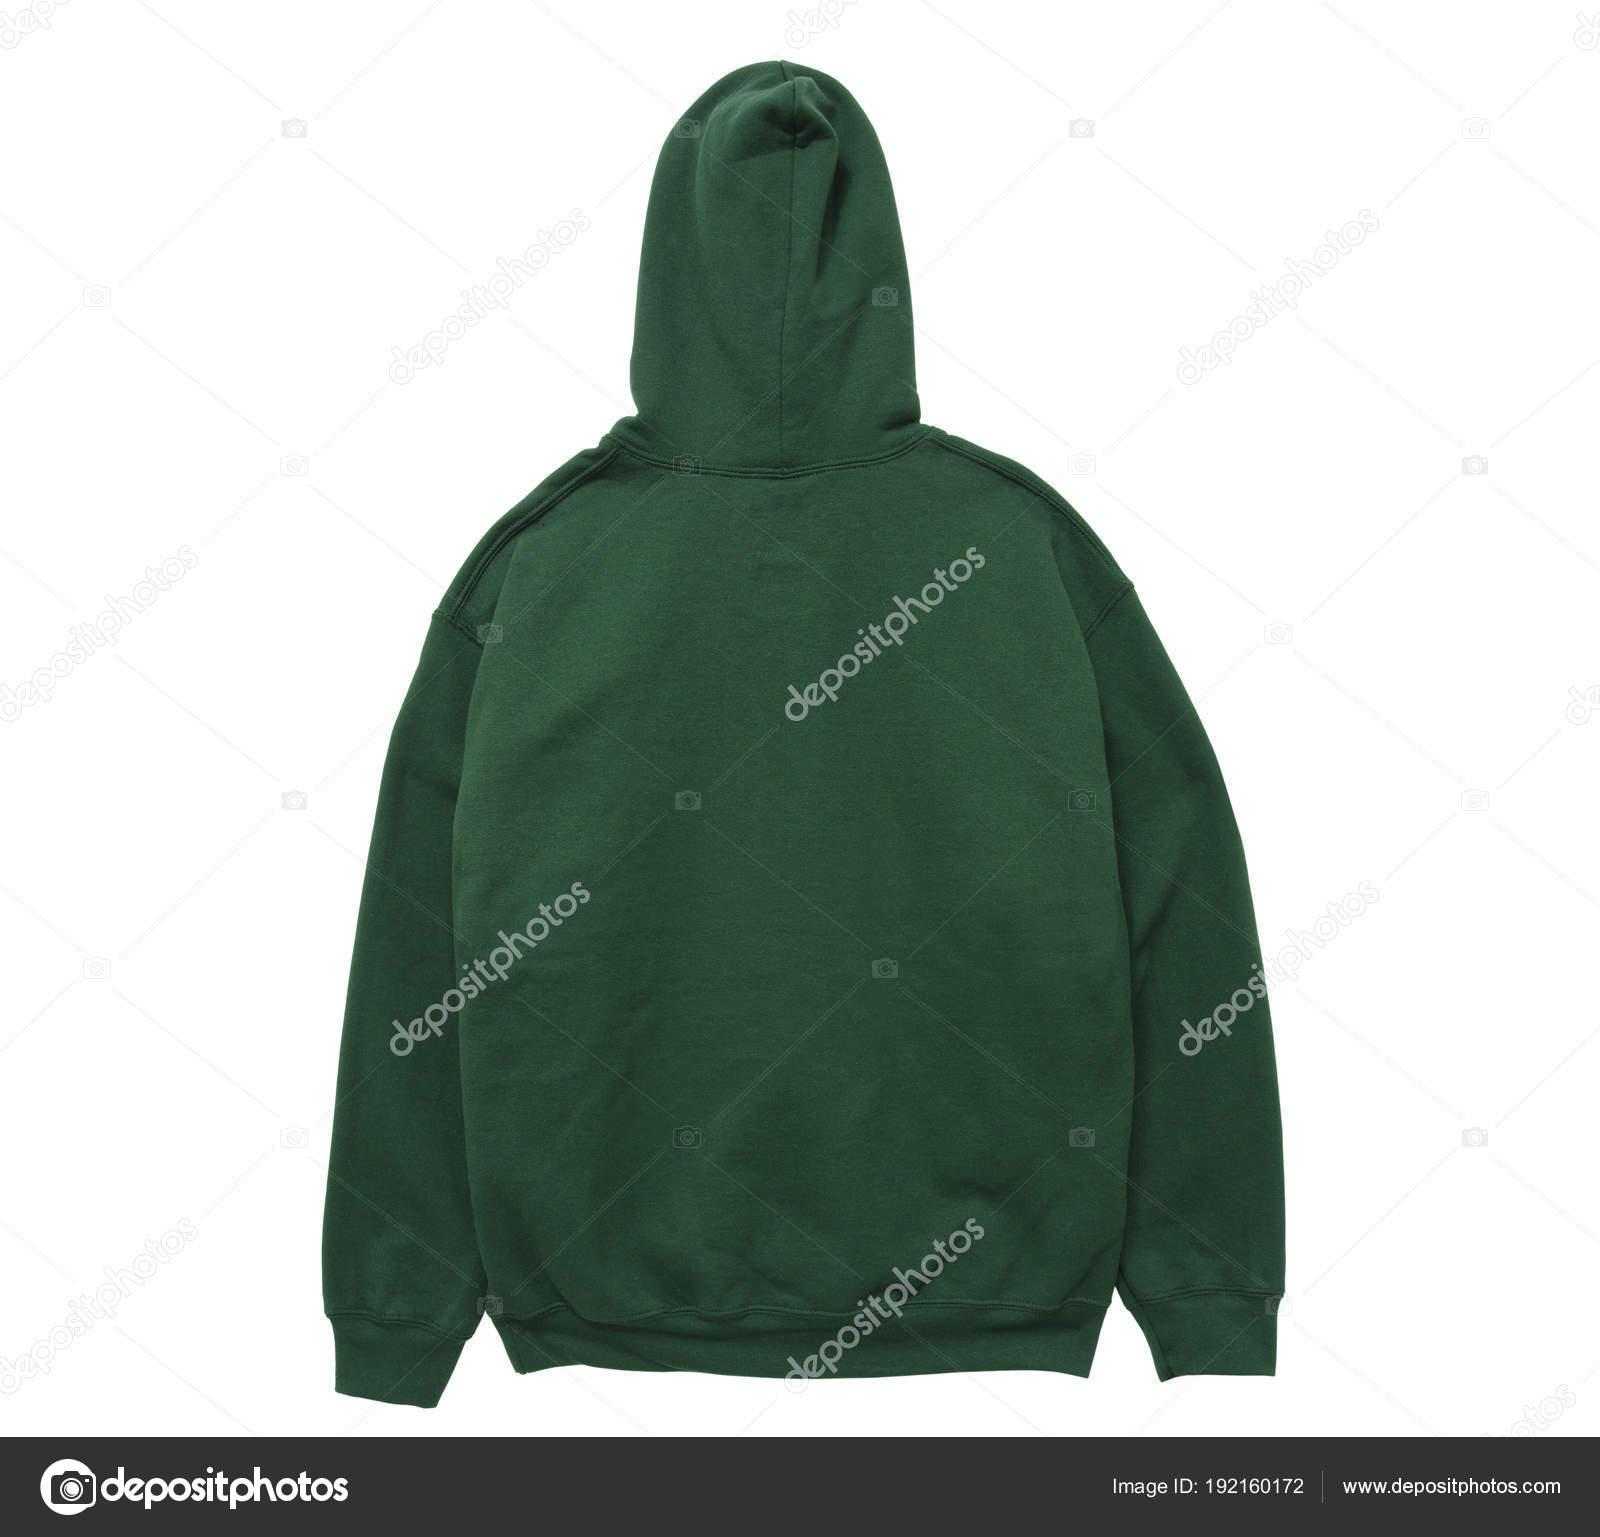 60f96d567ce1 Κενό Hoodie Φούτερ Πίσω Θέα Πράσινο Χρώμα Άσπρο Φόντο — Φωτογραφία Αρχείου